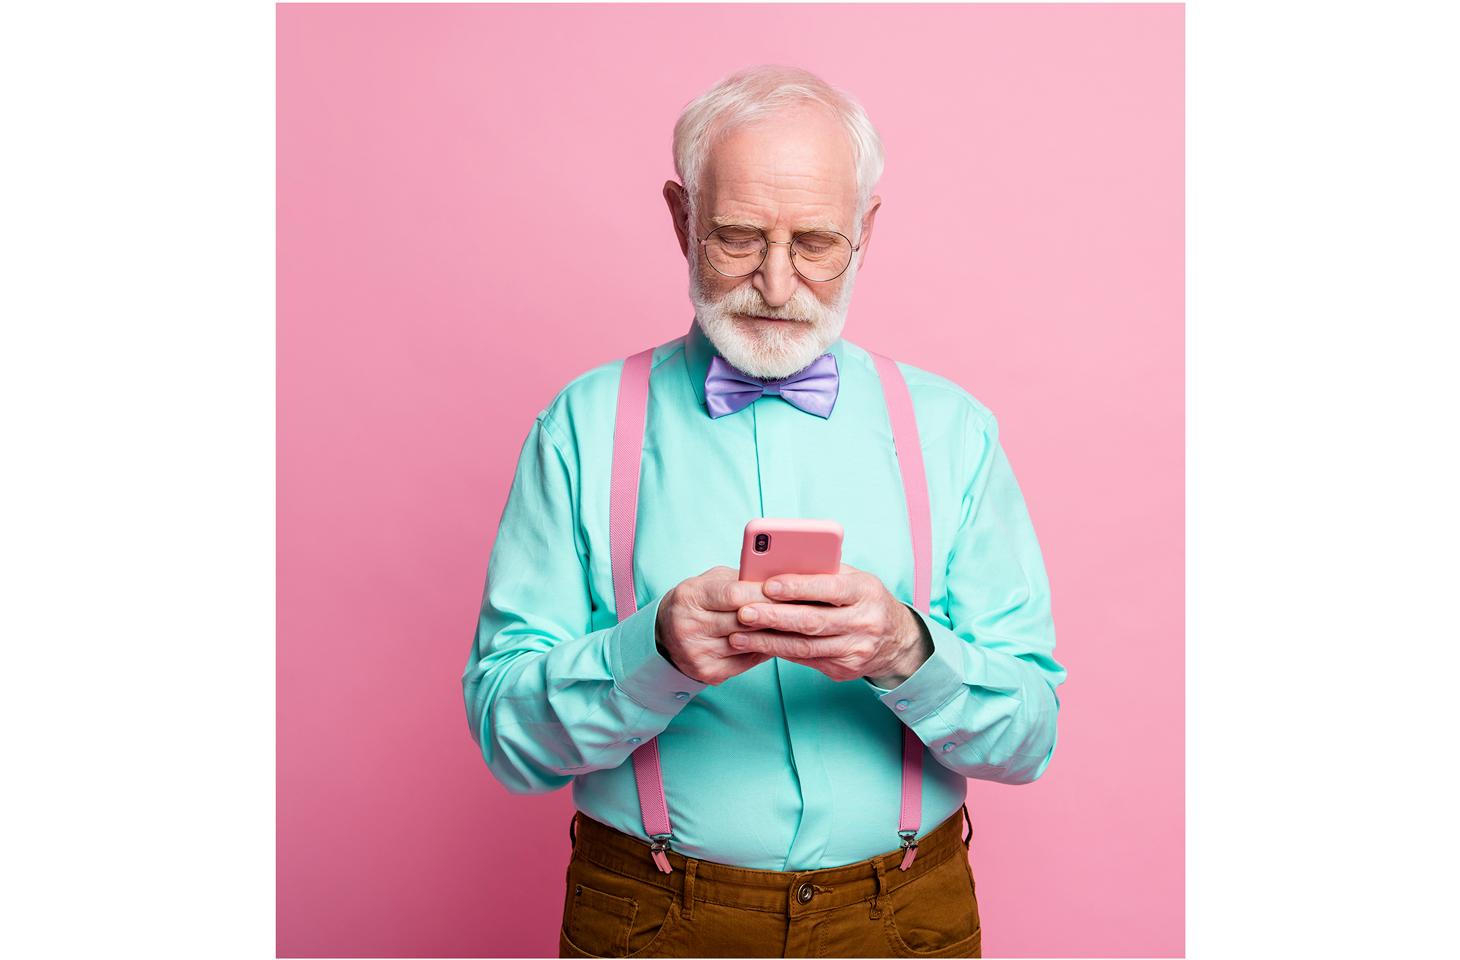 Richiesta di iOS di tracciare l'attività | Blog ufficiale di Kaspersky